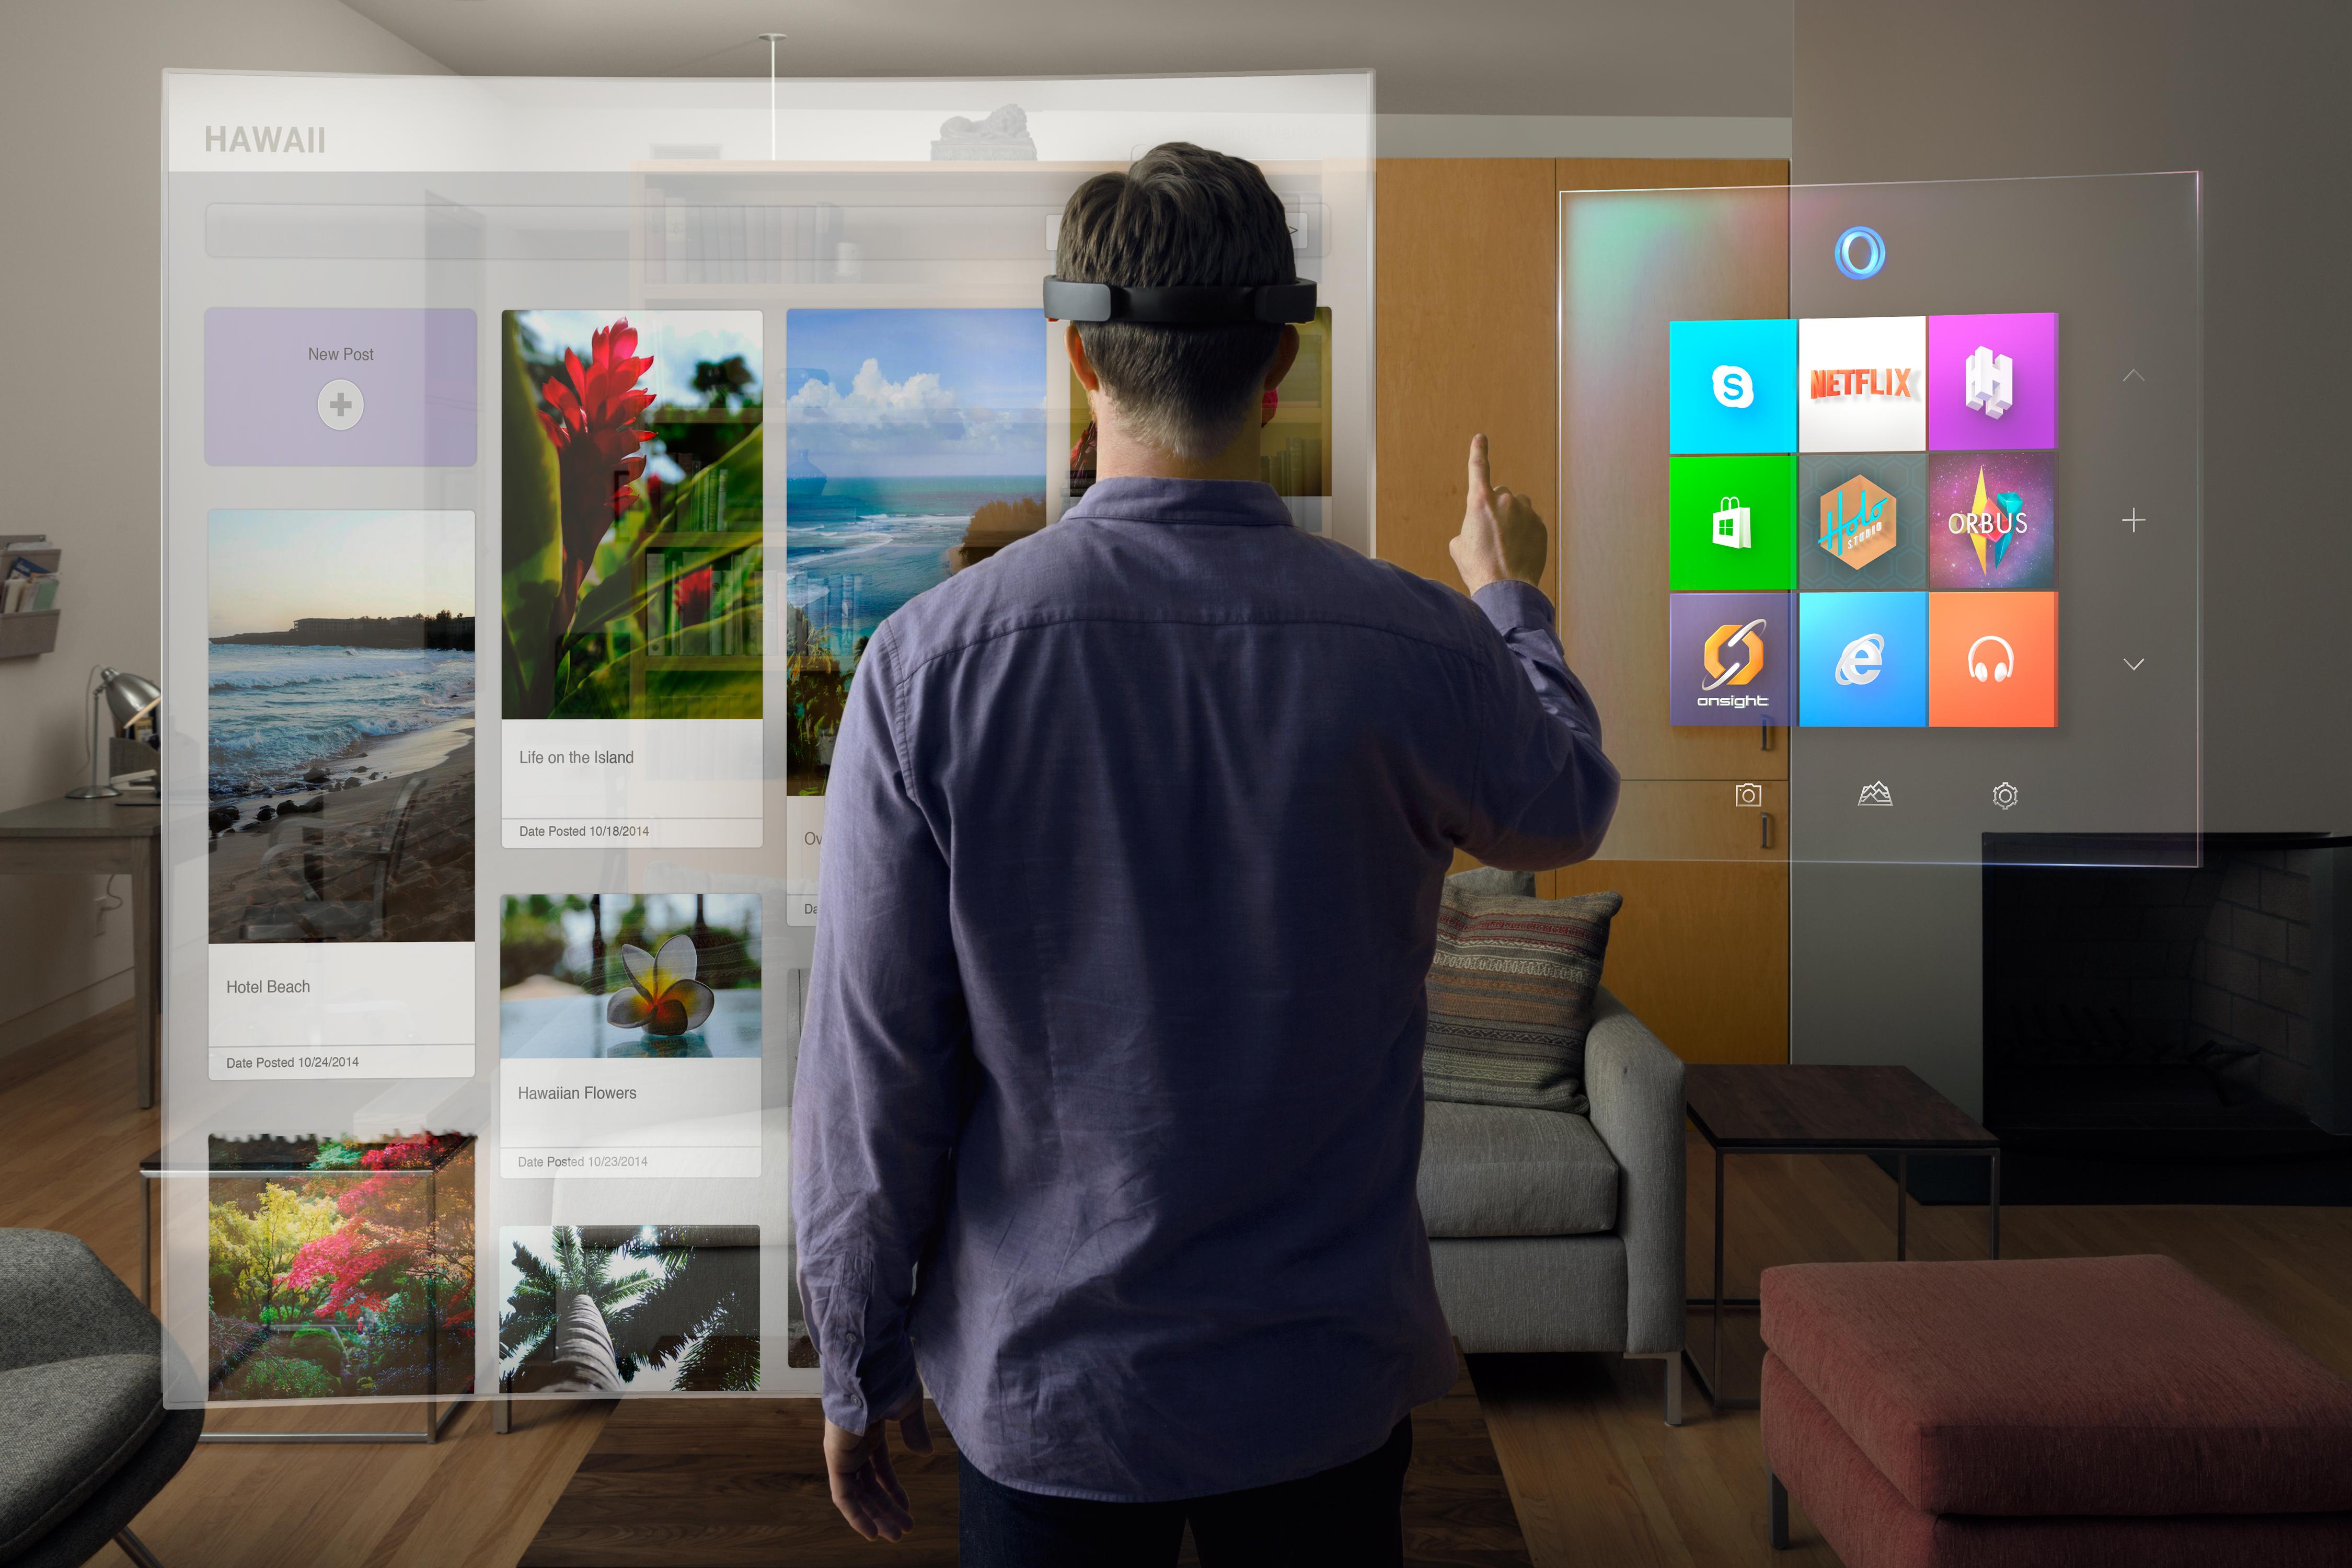 Microsoft's premiere AR device